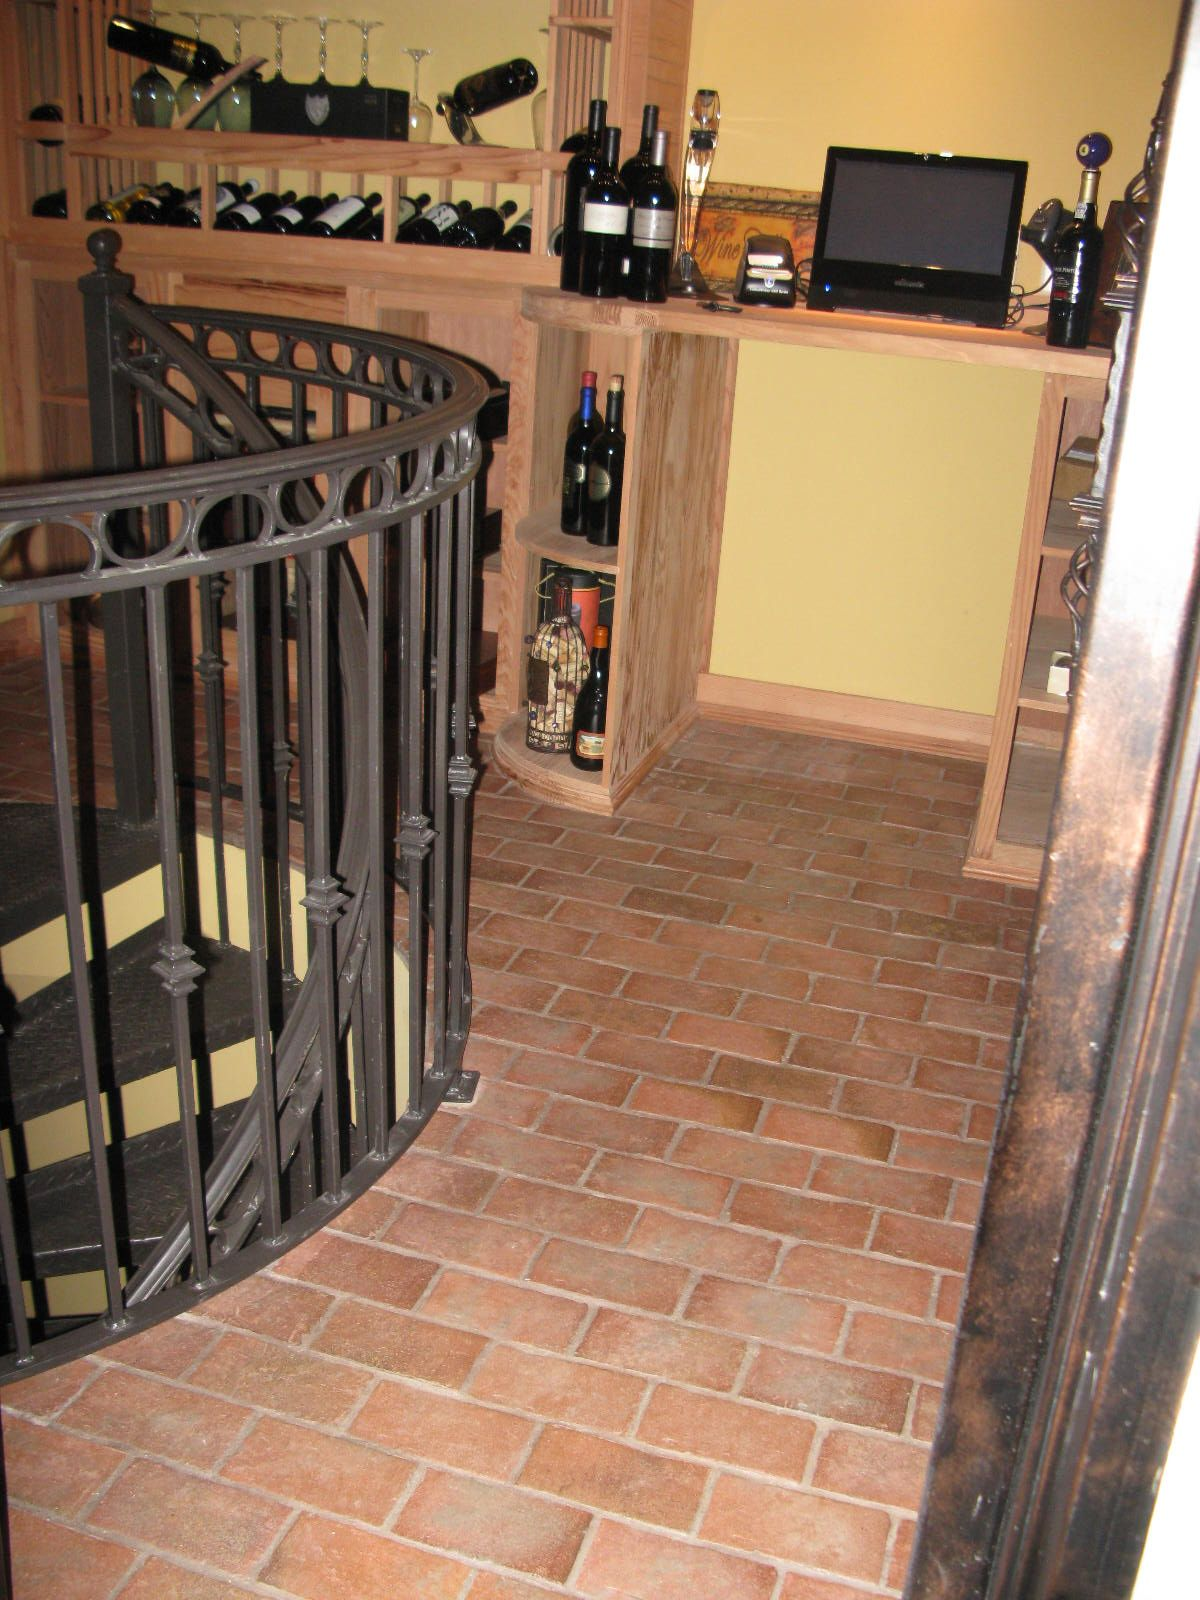 Rutherford brick tile floor in wine cellar providence color mix rutherford brick tile floor in wine cellar providence color mix dailygadgetfo Images